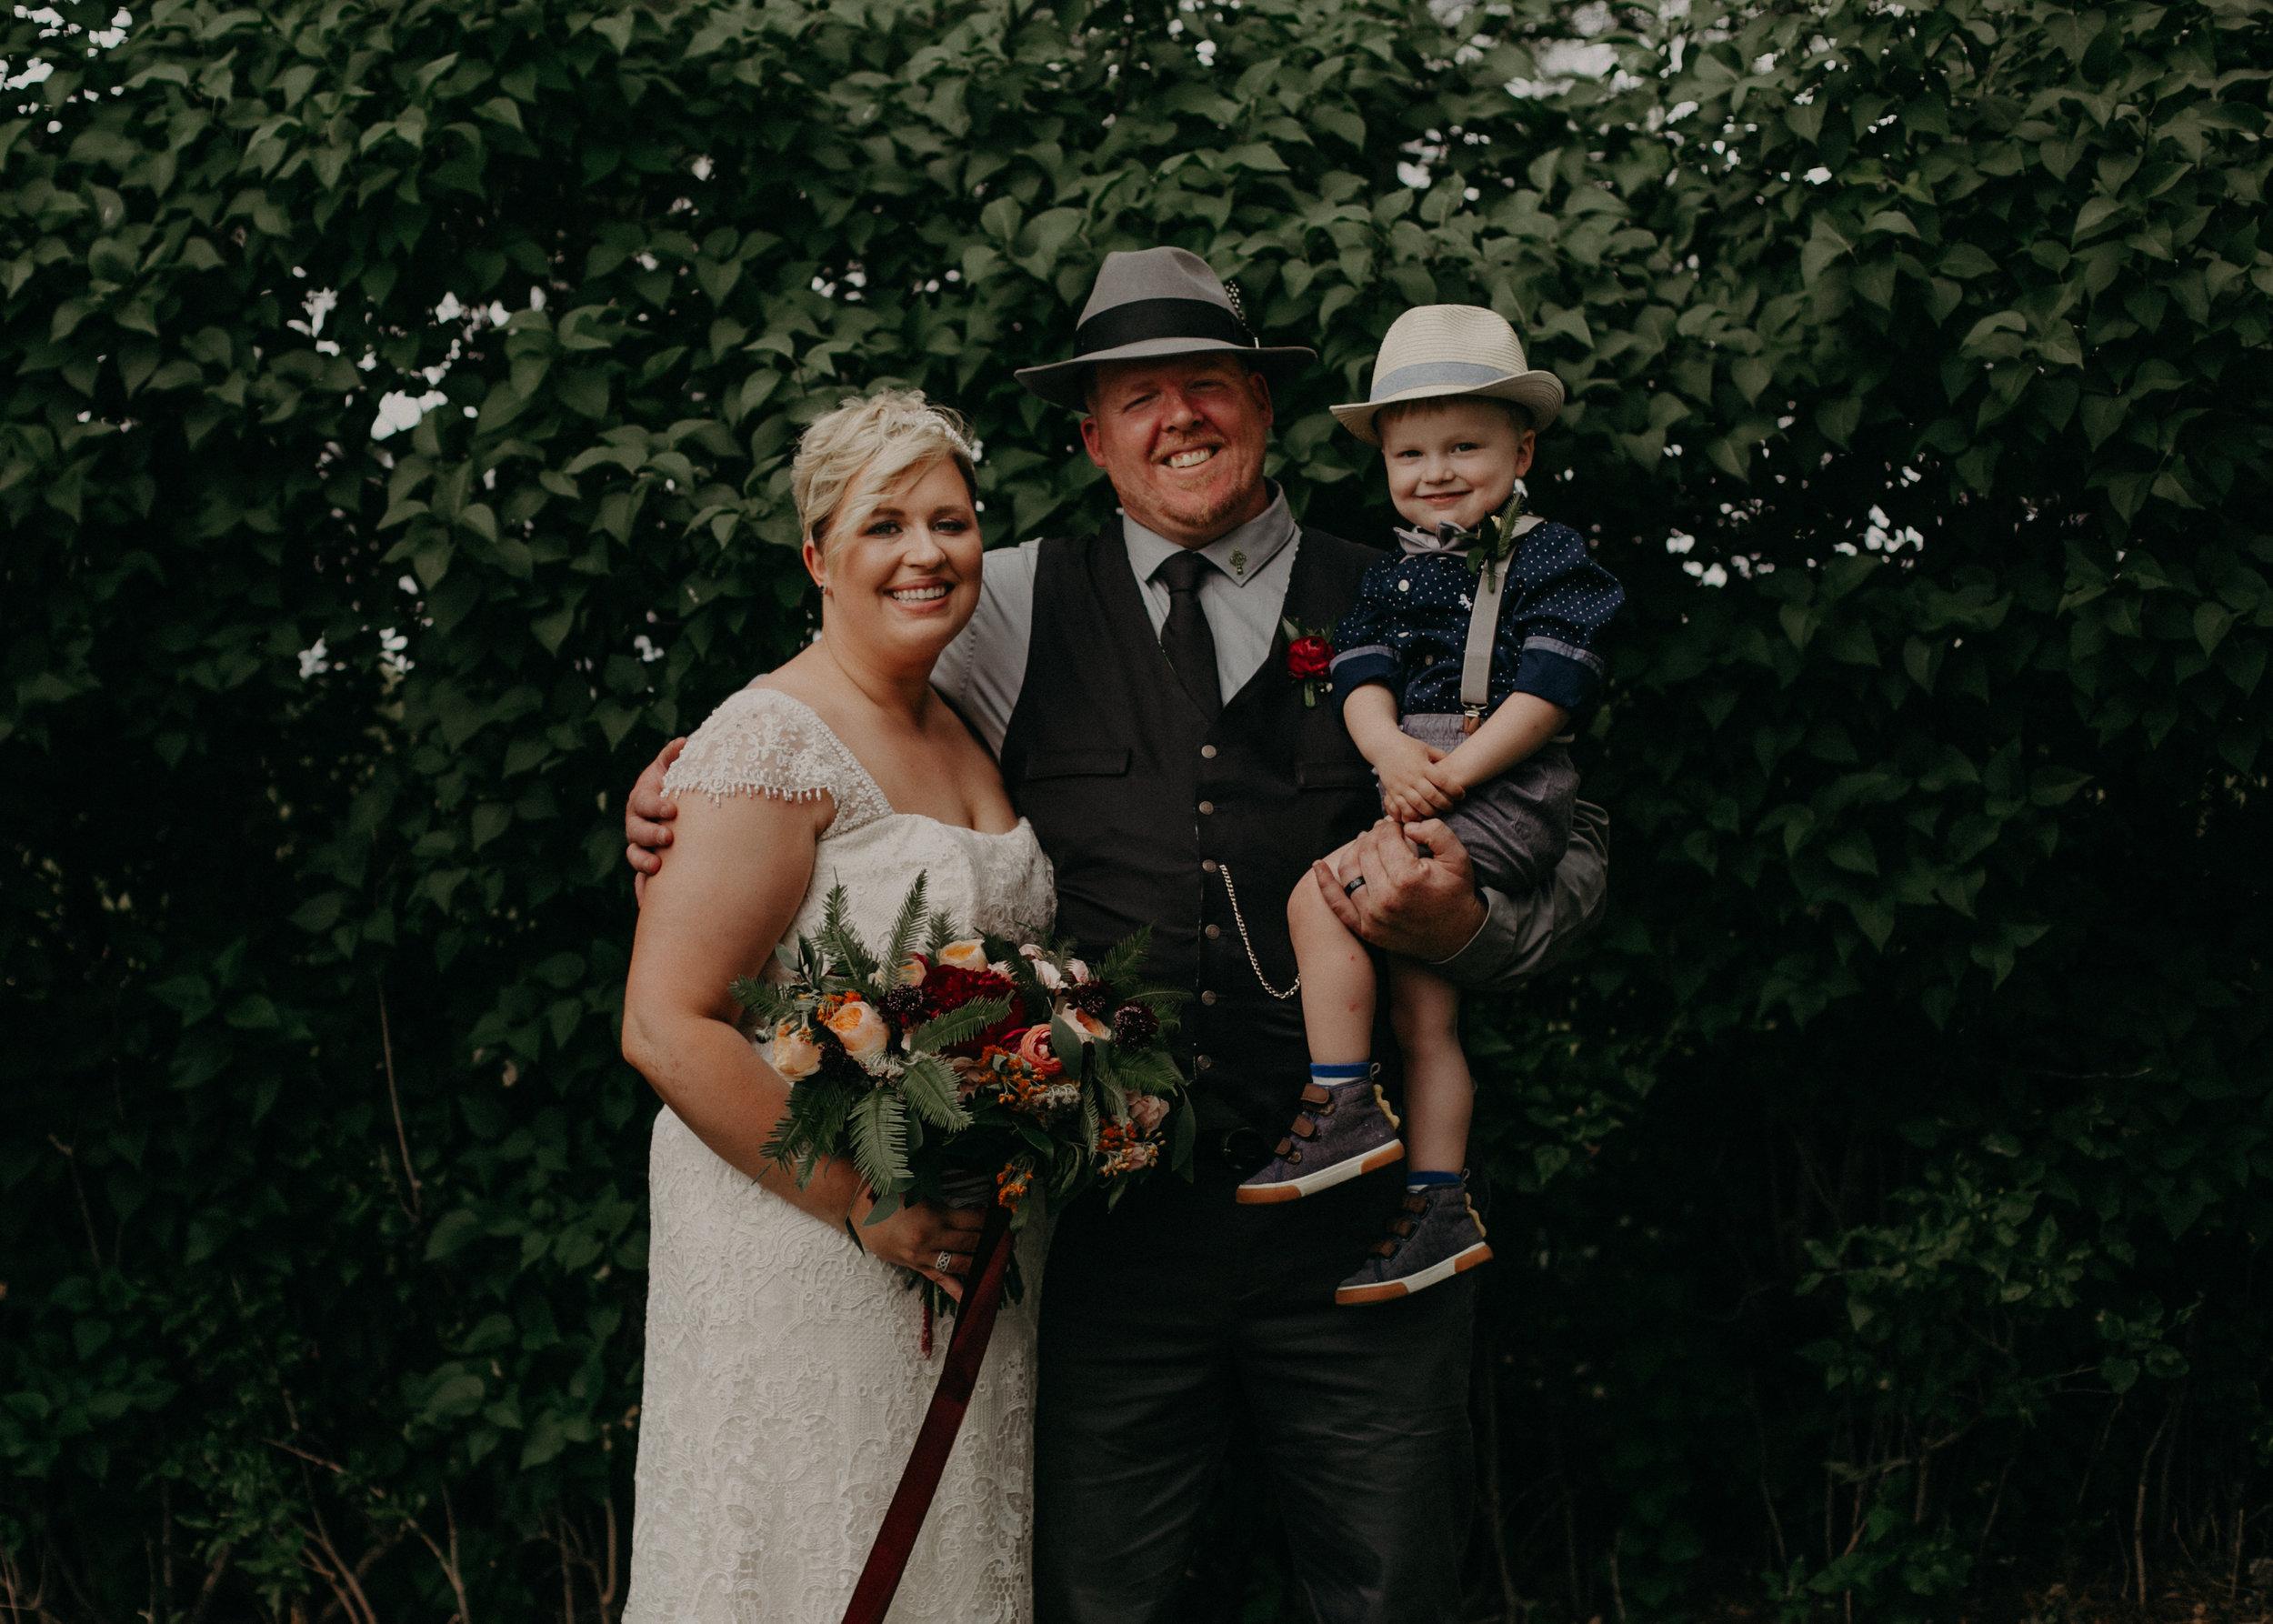 Ellsworth_WI_Barn_Jean_Acres_Wedding_AWP (44 of 57).jpg